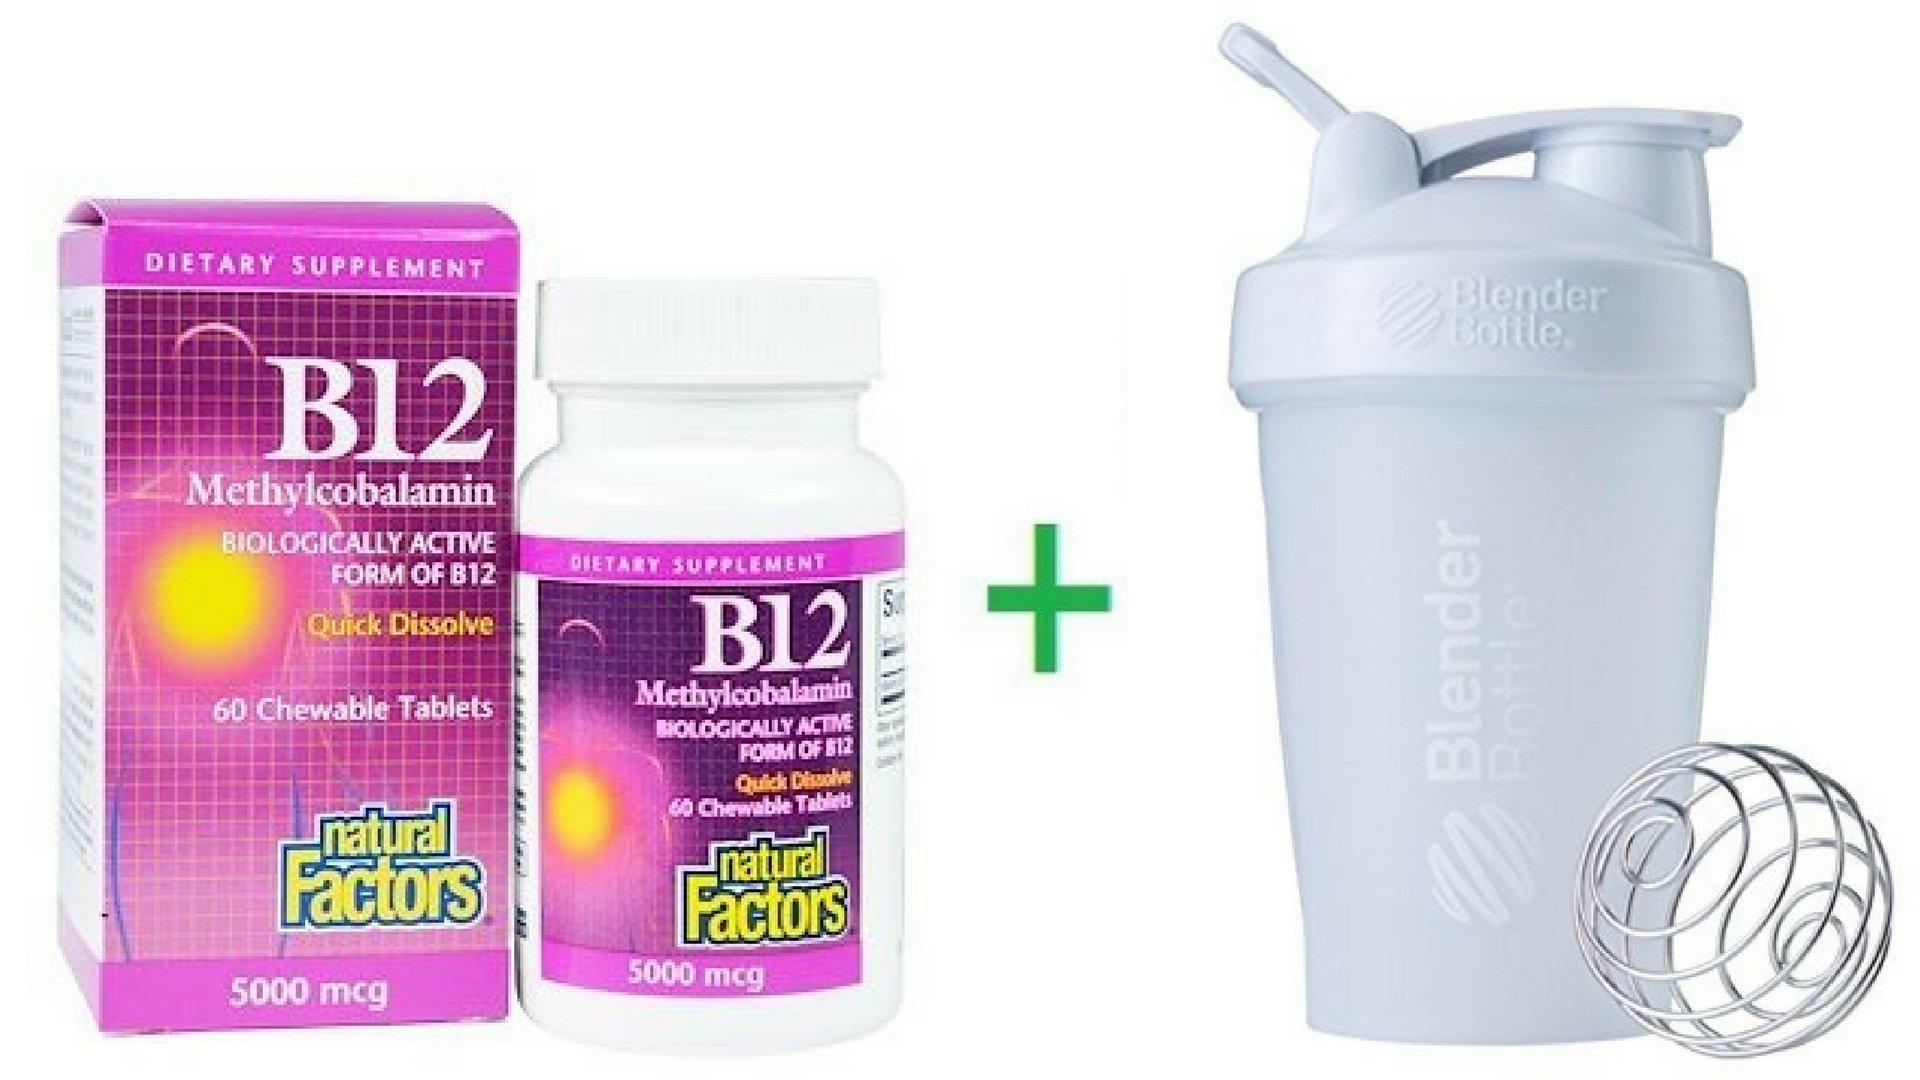 Natural Factors, B12, Methylcobalamin, 5000 mcg, 60 Chewable Tablets + Sundesa, BlenderBottle, Classic With Loop, White, 20 oz